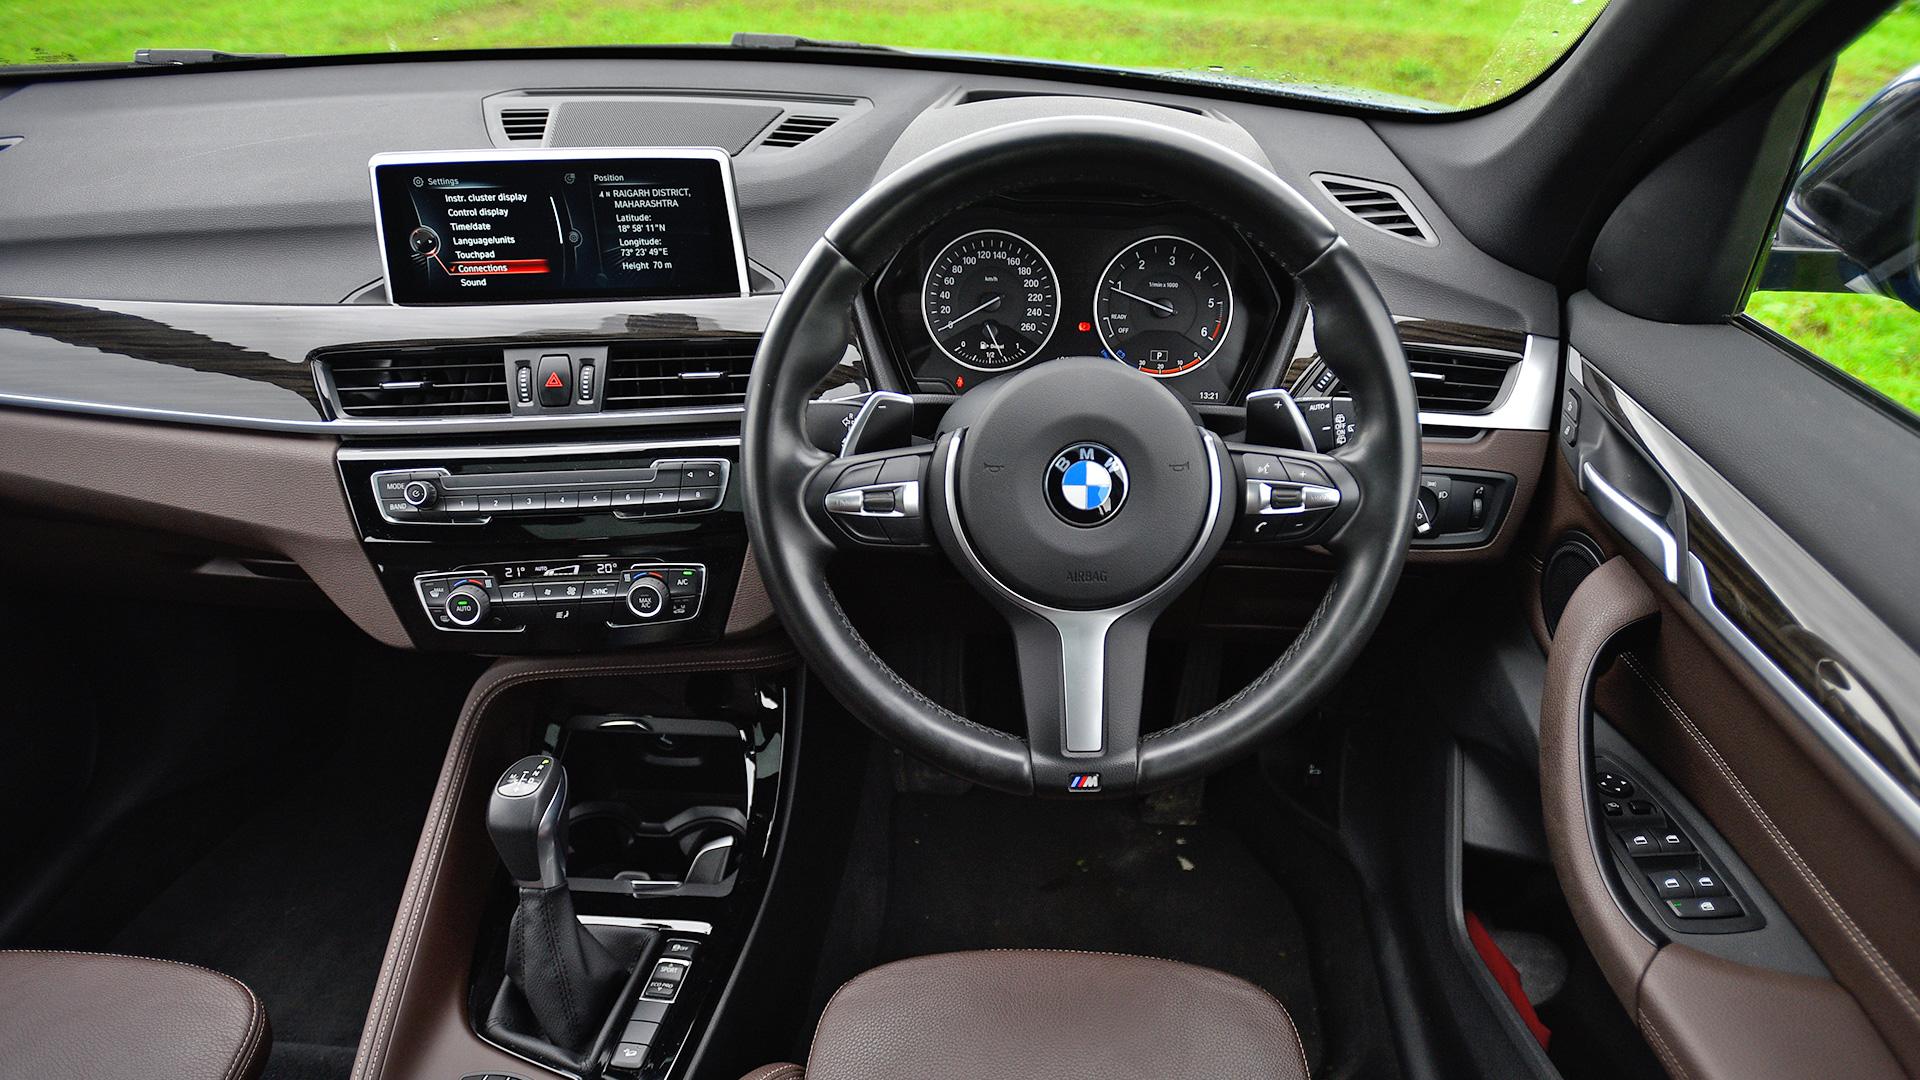 Bmw X1 2018 Xdrive 20d M Sport Interior Car Photos Overdrive